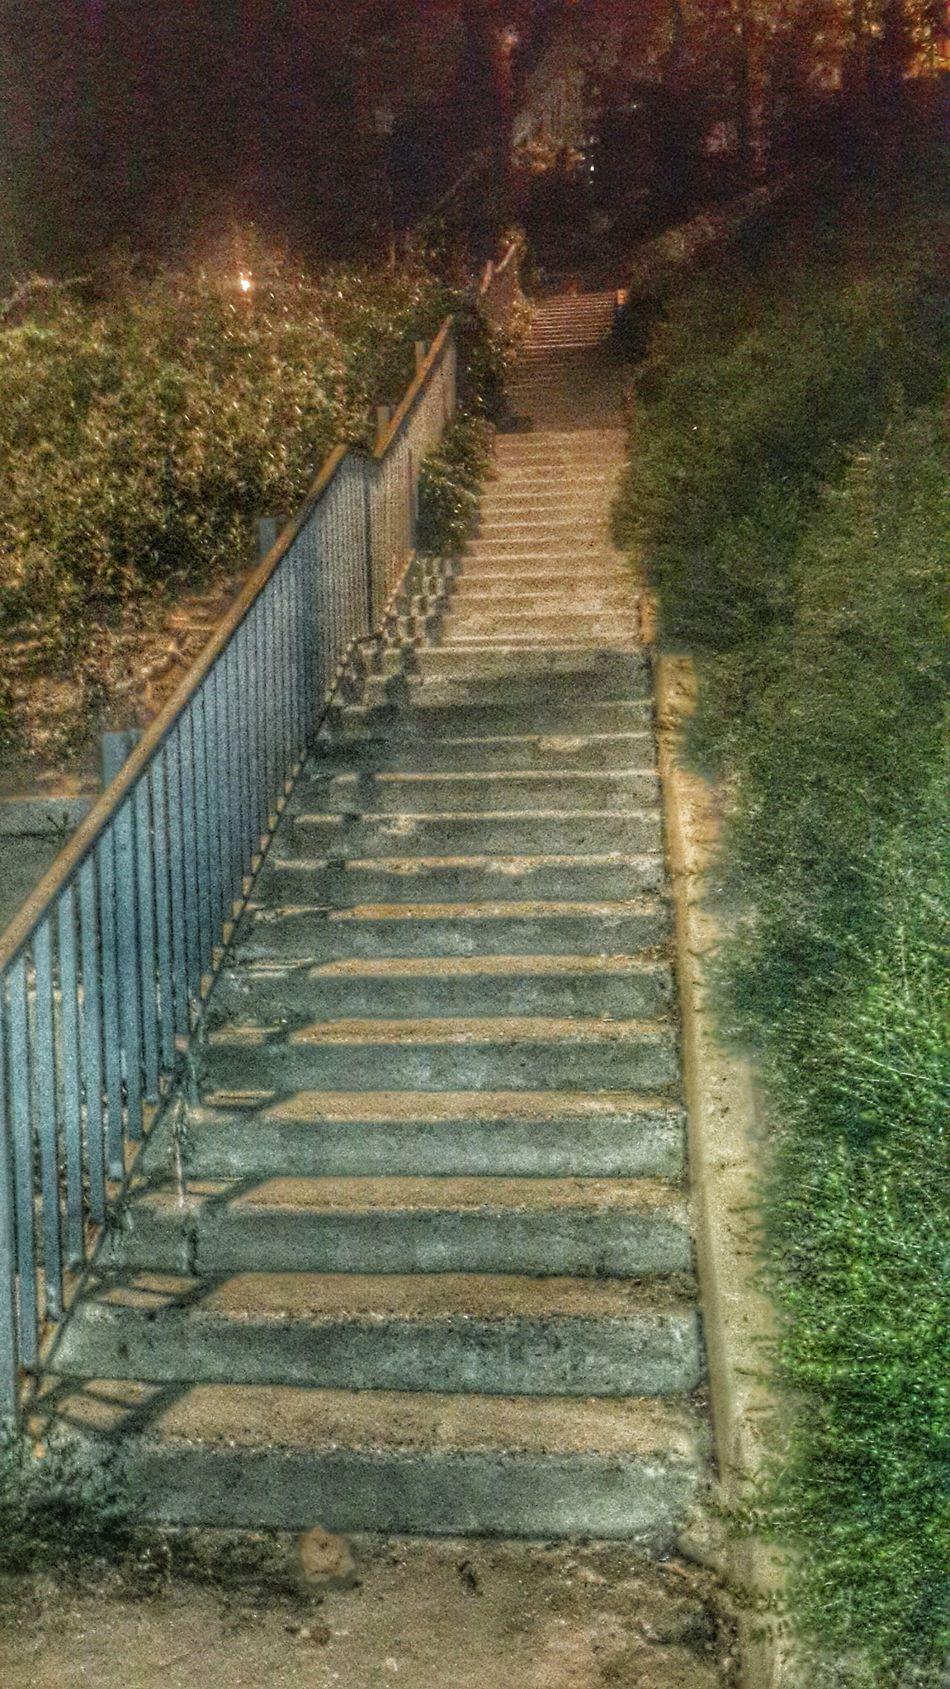 👣👣 Stairs Come Out  Tiring Nightphotography Benimkadrajim Night Eyemmarket Anıyakala Eye4photography  Nature Photography EyeEm Gallery Eyem Best Shots Nature_collection EyeEm Nature Lover EyeEm Best Shots EyeEmBestPics Eyemphotography Eyem Eyemphotos